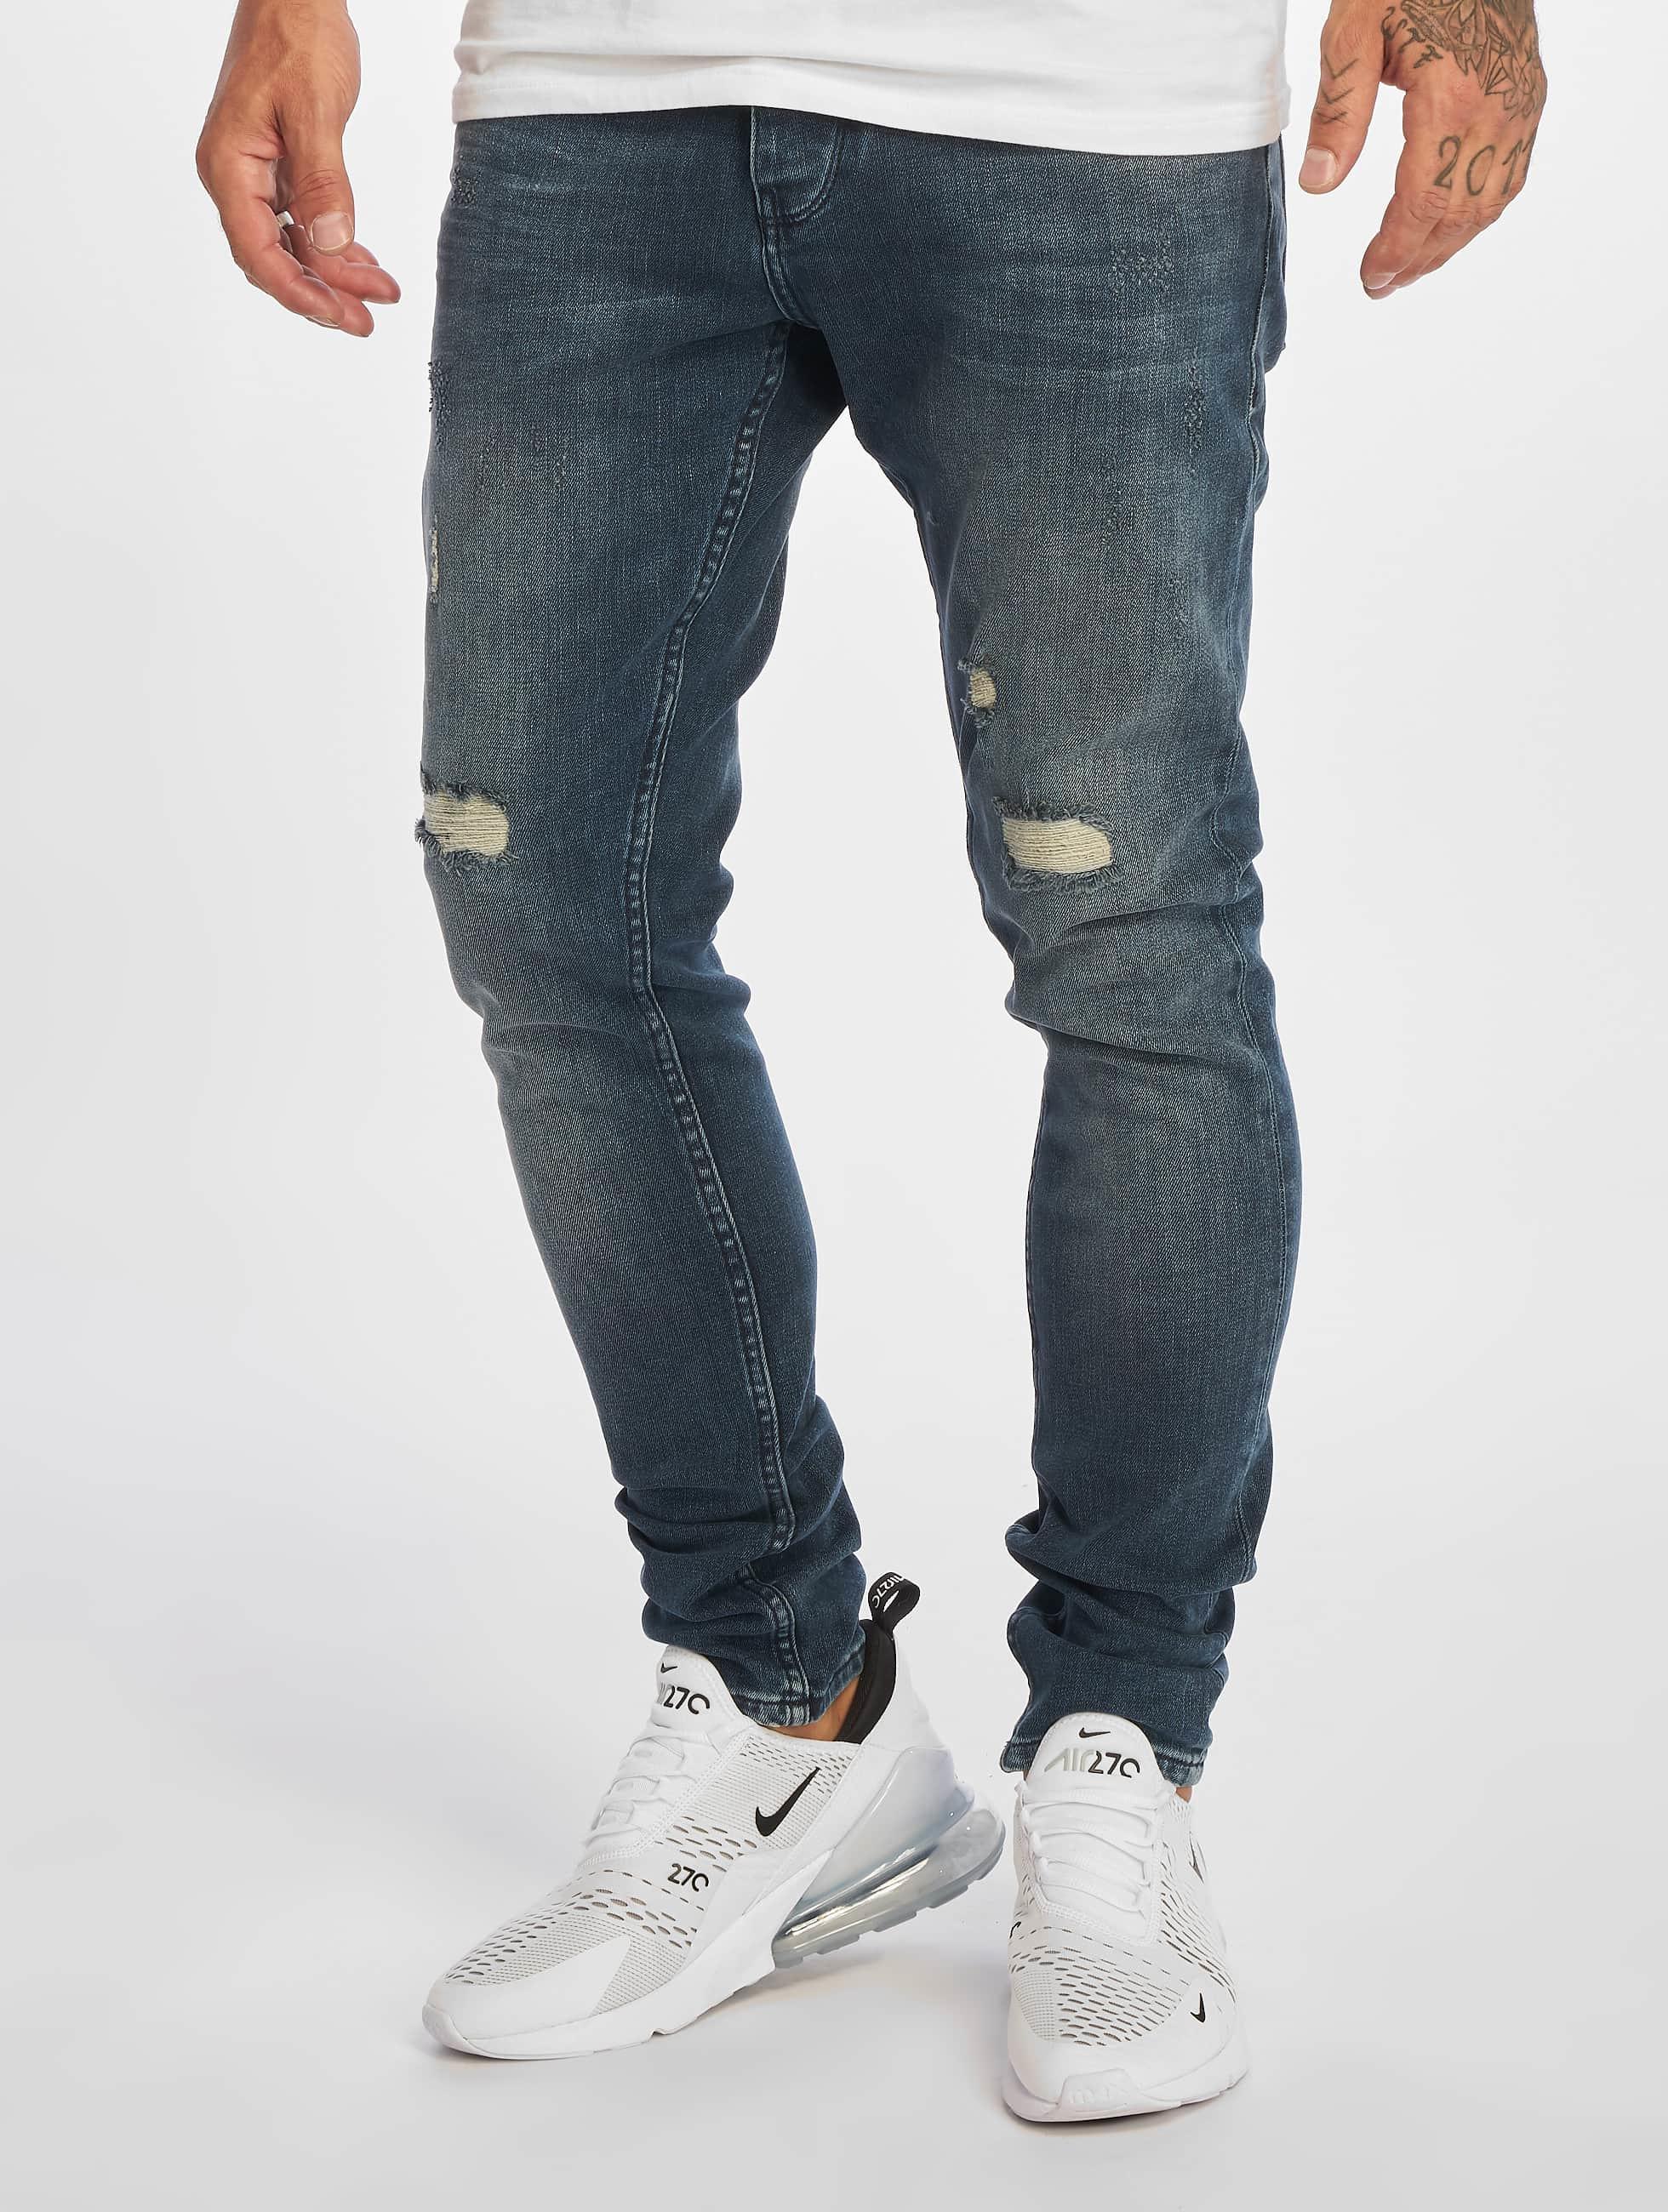 DEF / Slim Fit Jeans Yunus in blue W 31 L 34